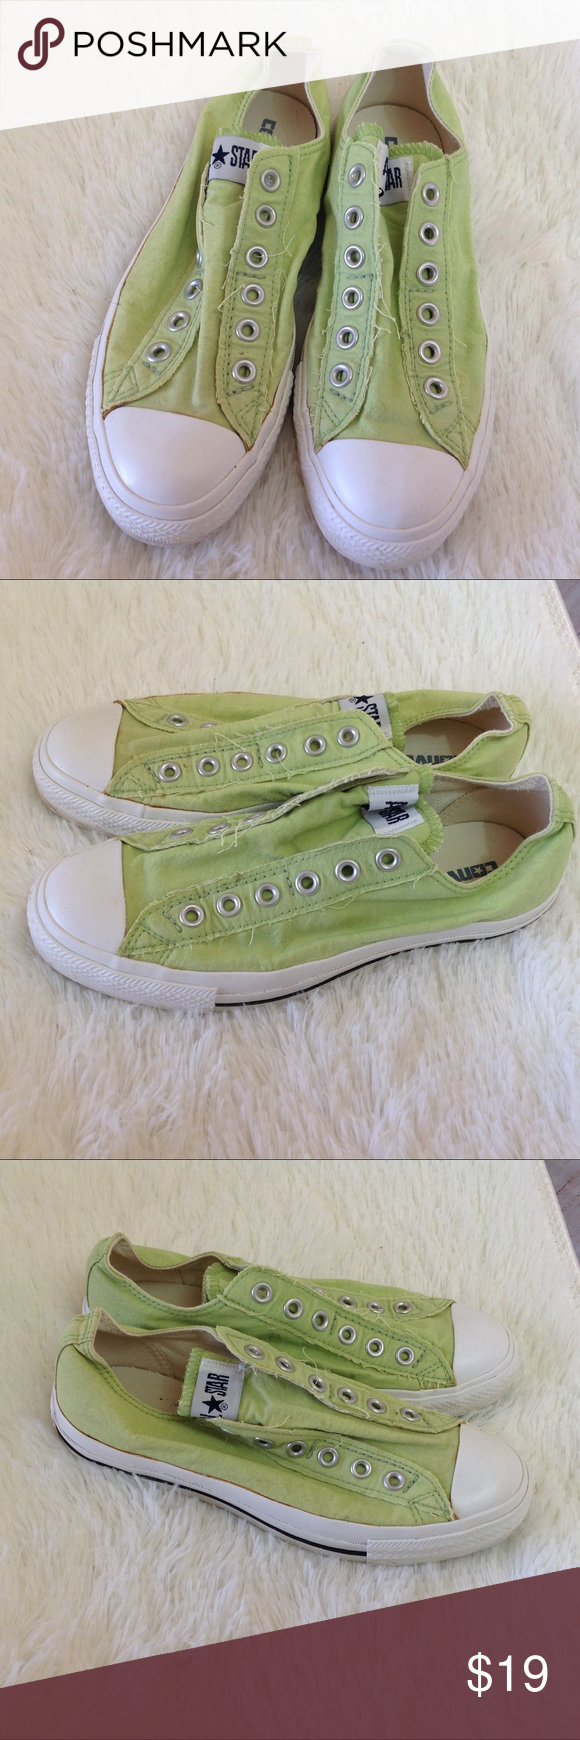 b108ff4d949eea Lime Green Converse All Stars Shoe Information Maker  Converse ♥ Material   Man Made ♥